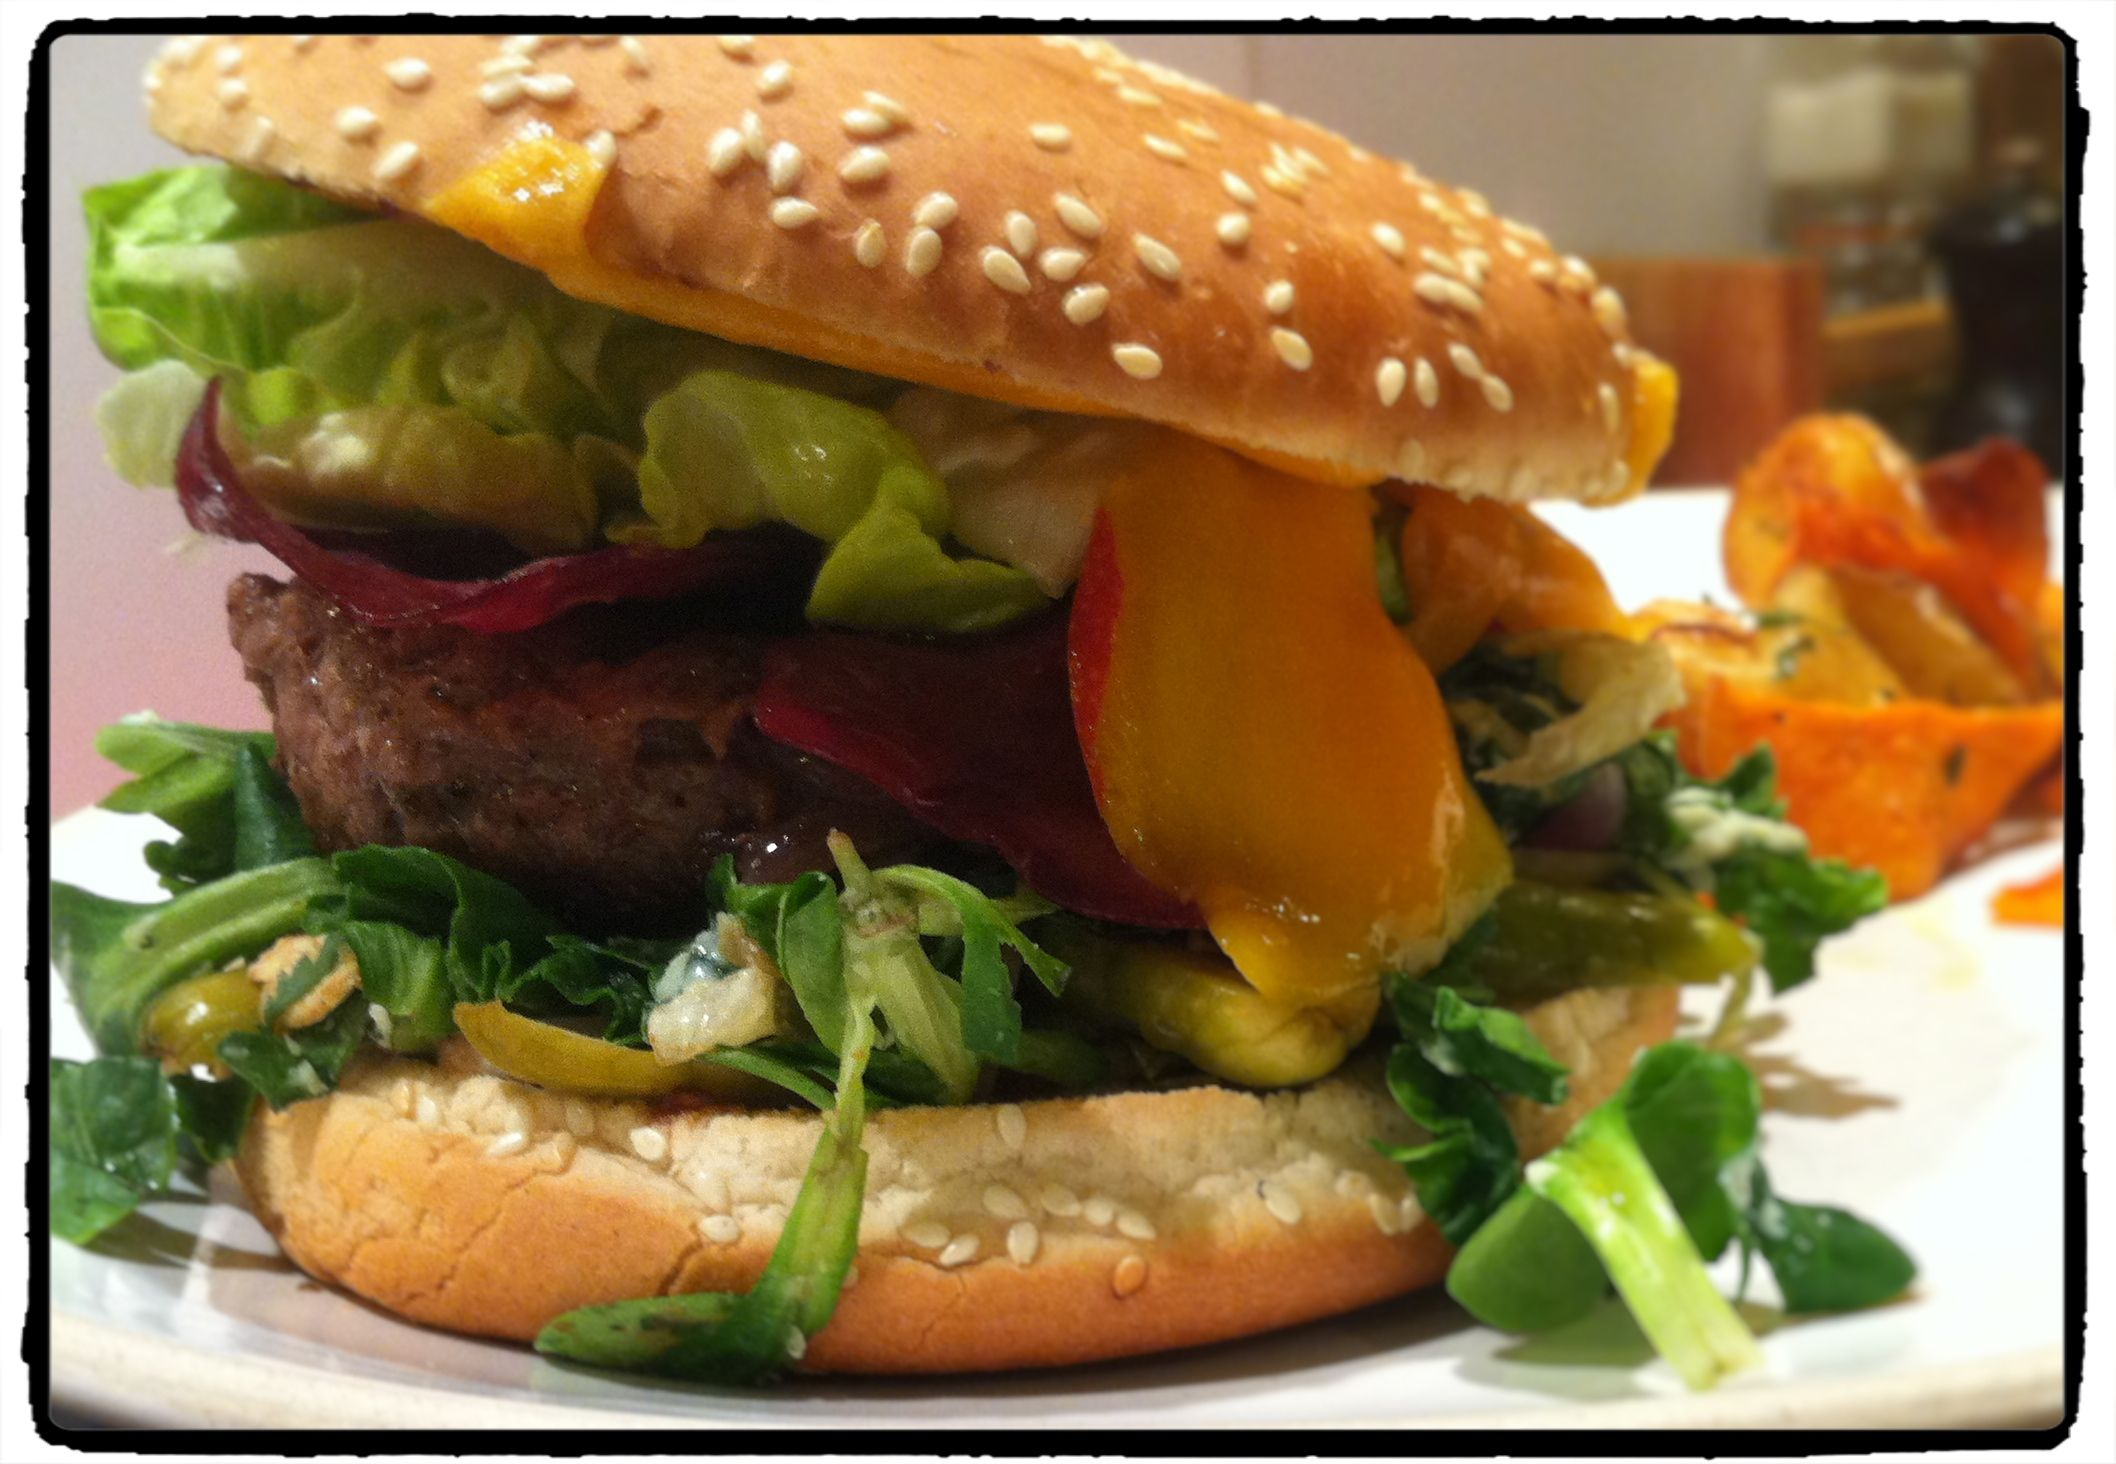 Le burger mangue, garam masala...